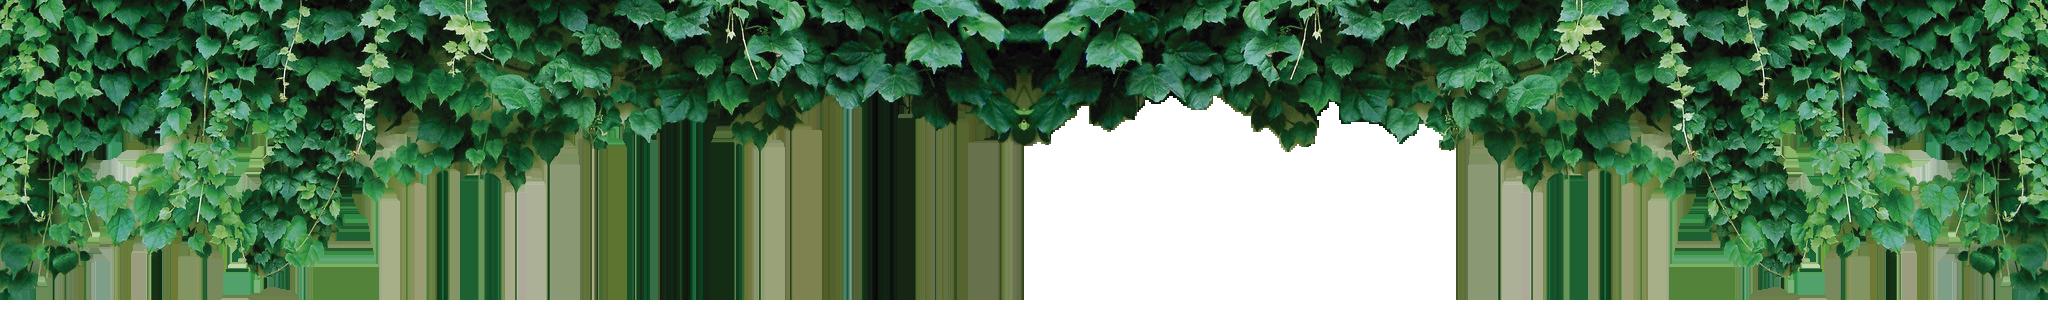 parthenocissu